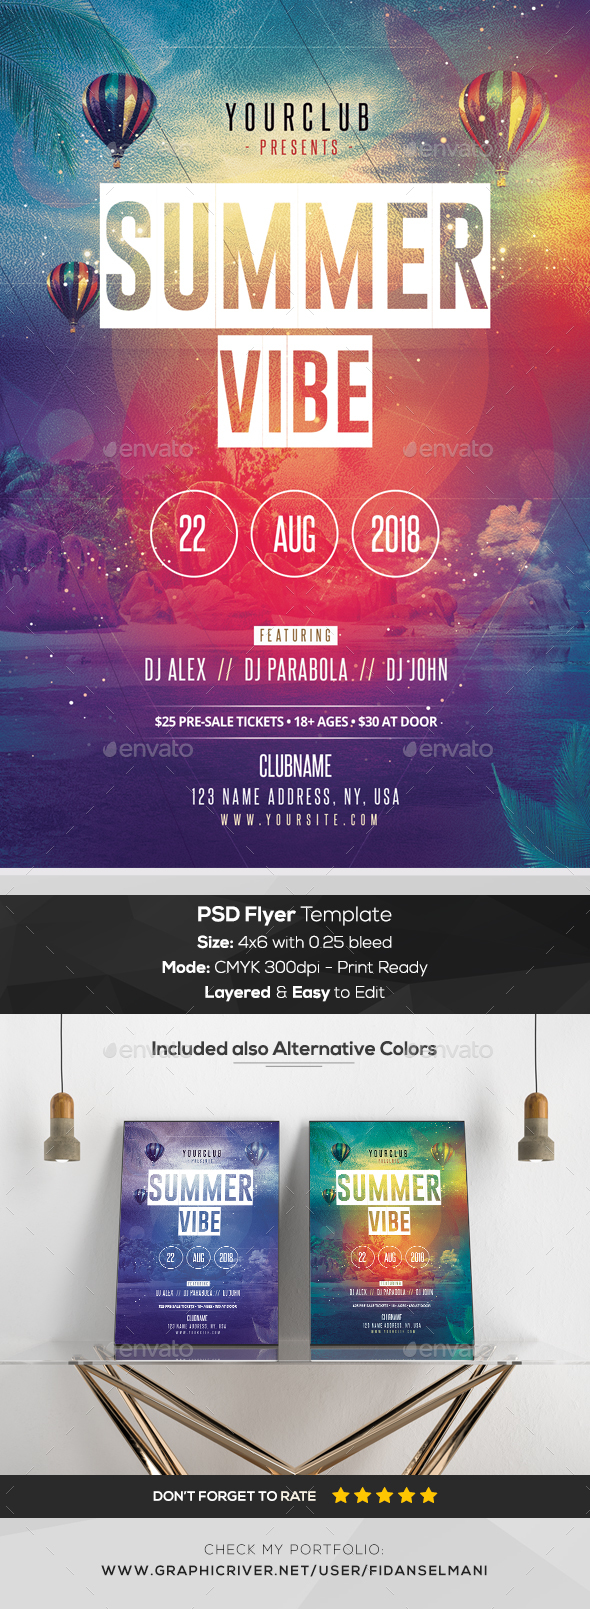 Summer Vibe - PSD Flyer - Events Flyers